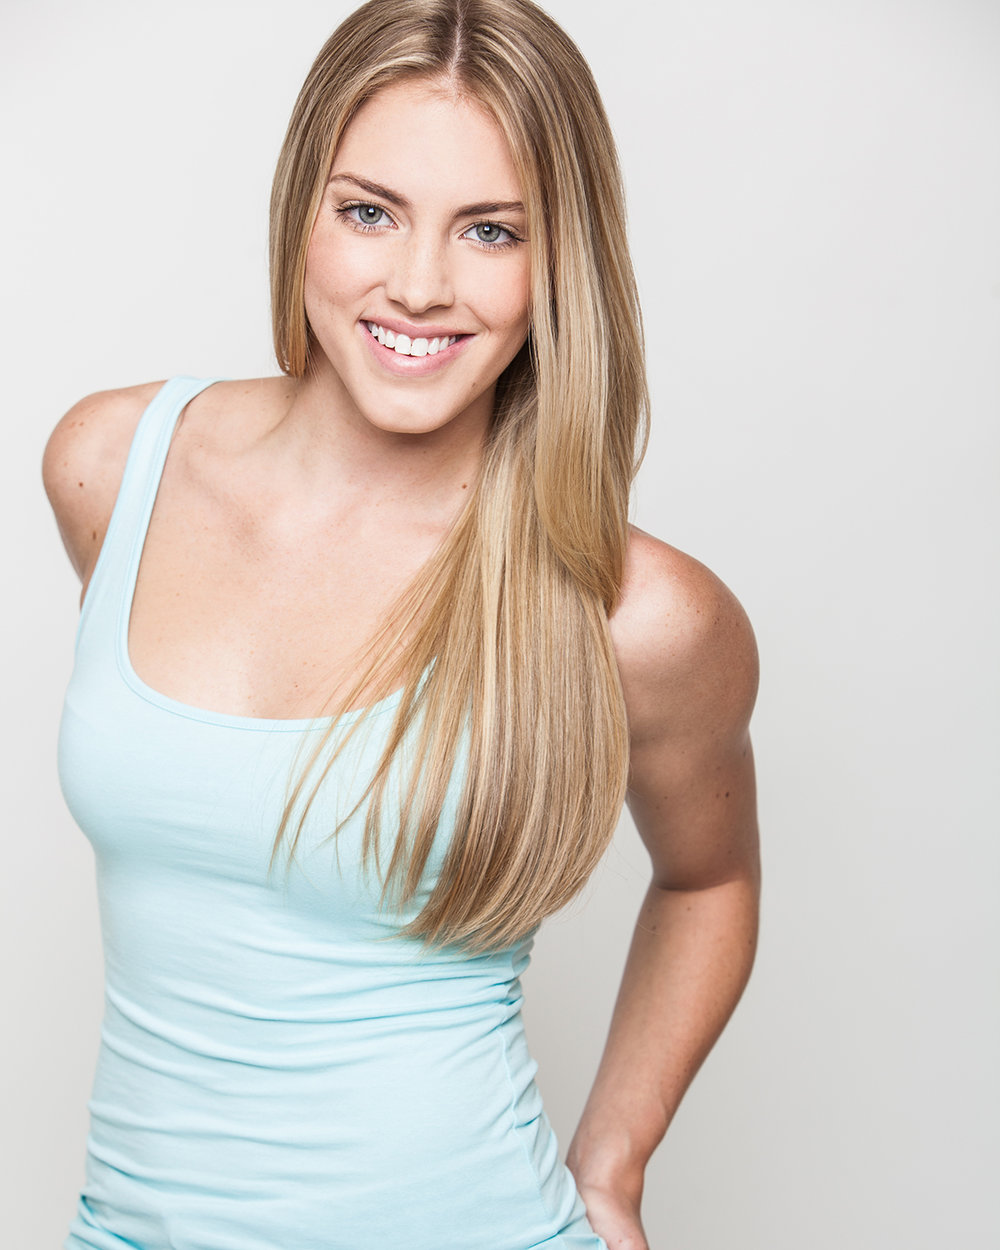 Bridget Krouse